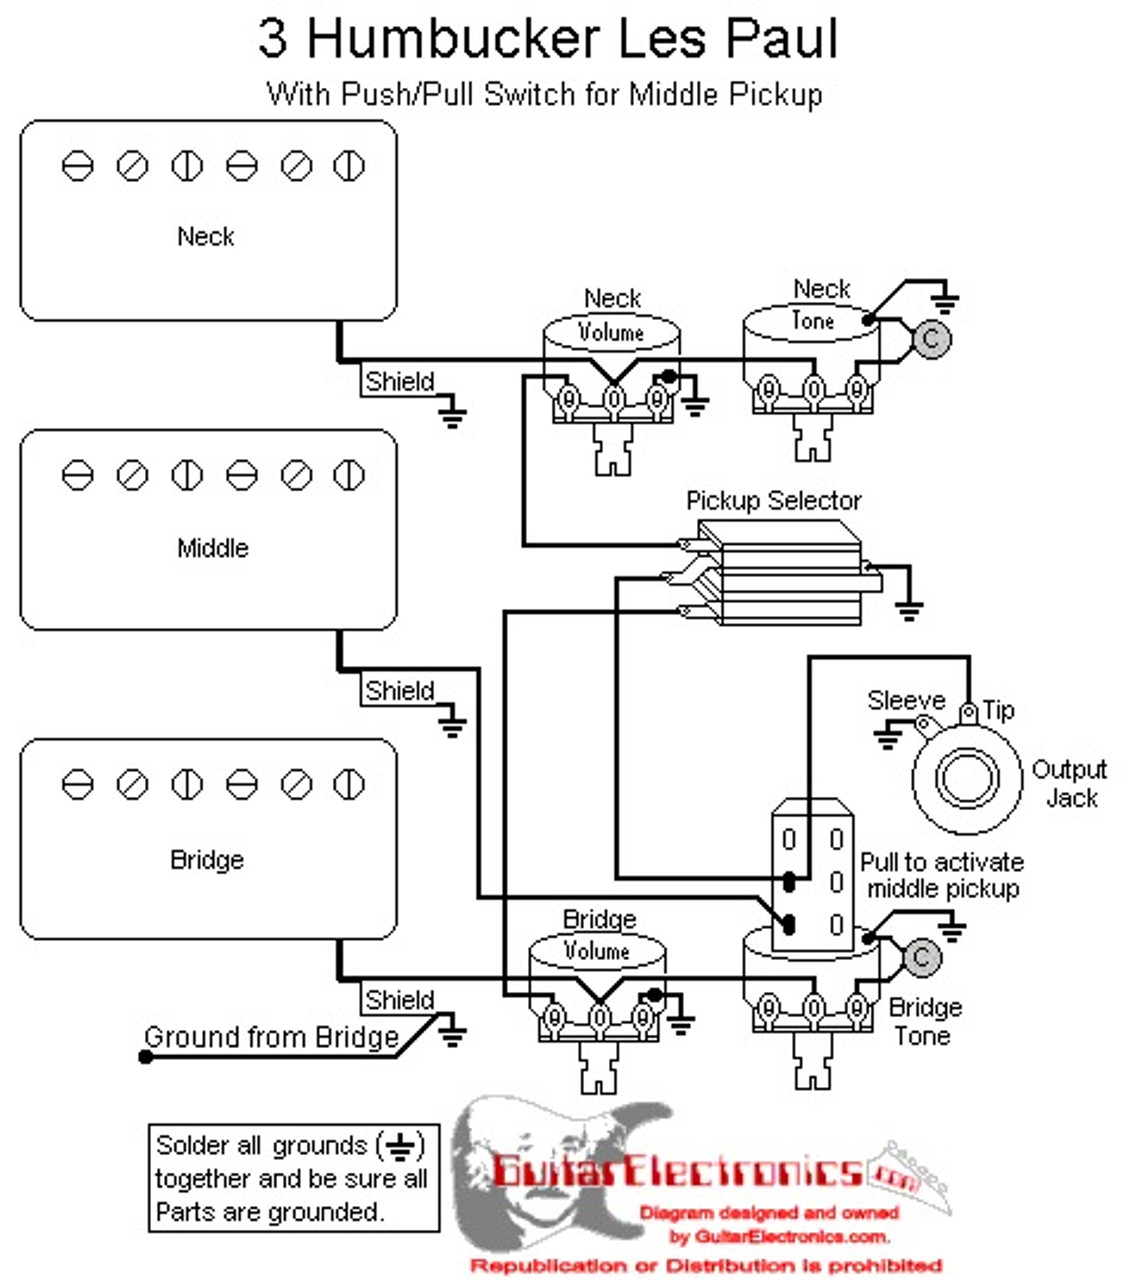 3 humbucker wiring diagram wiring diagram datasource re 3 humbucker wiring help [ 1128 x 1280 Pixel ]